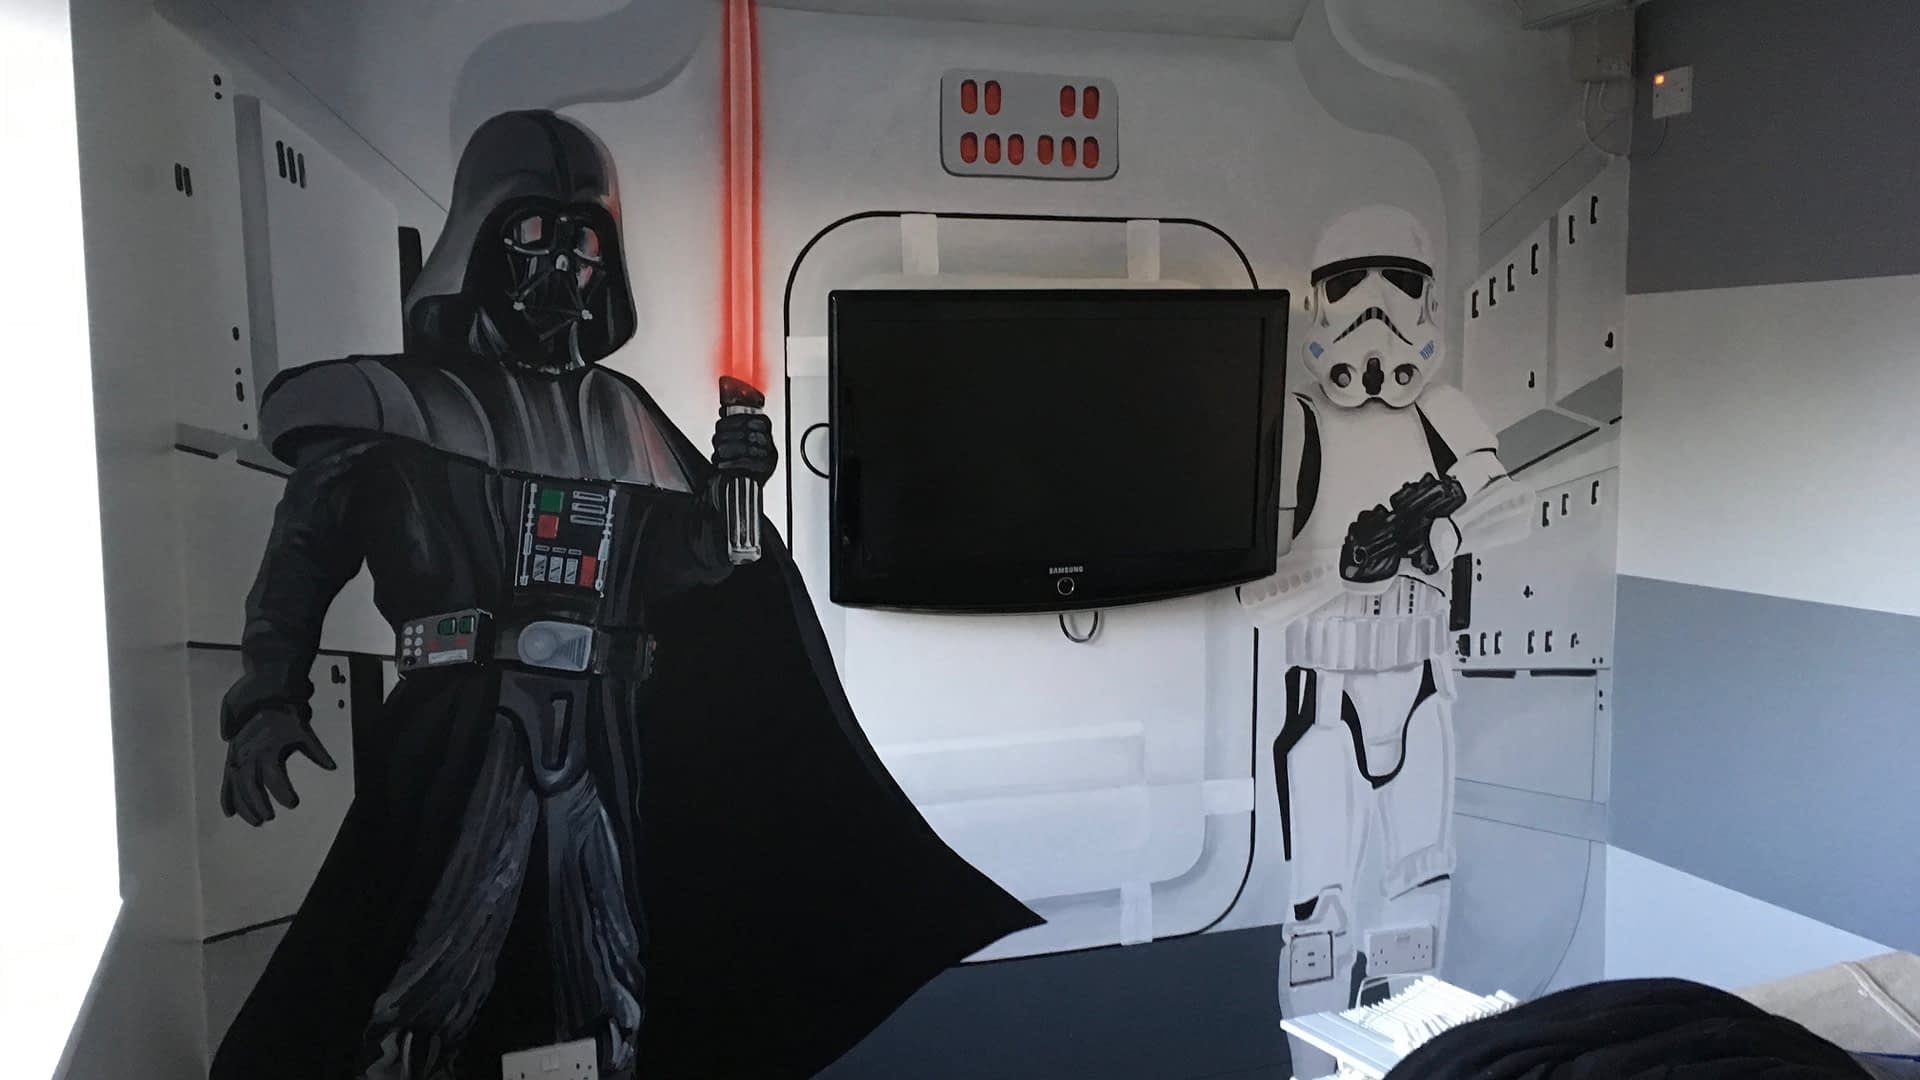 Darth Vader / Stormtrooper Mural